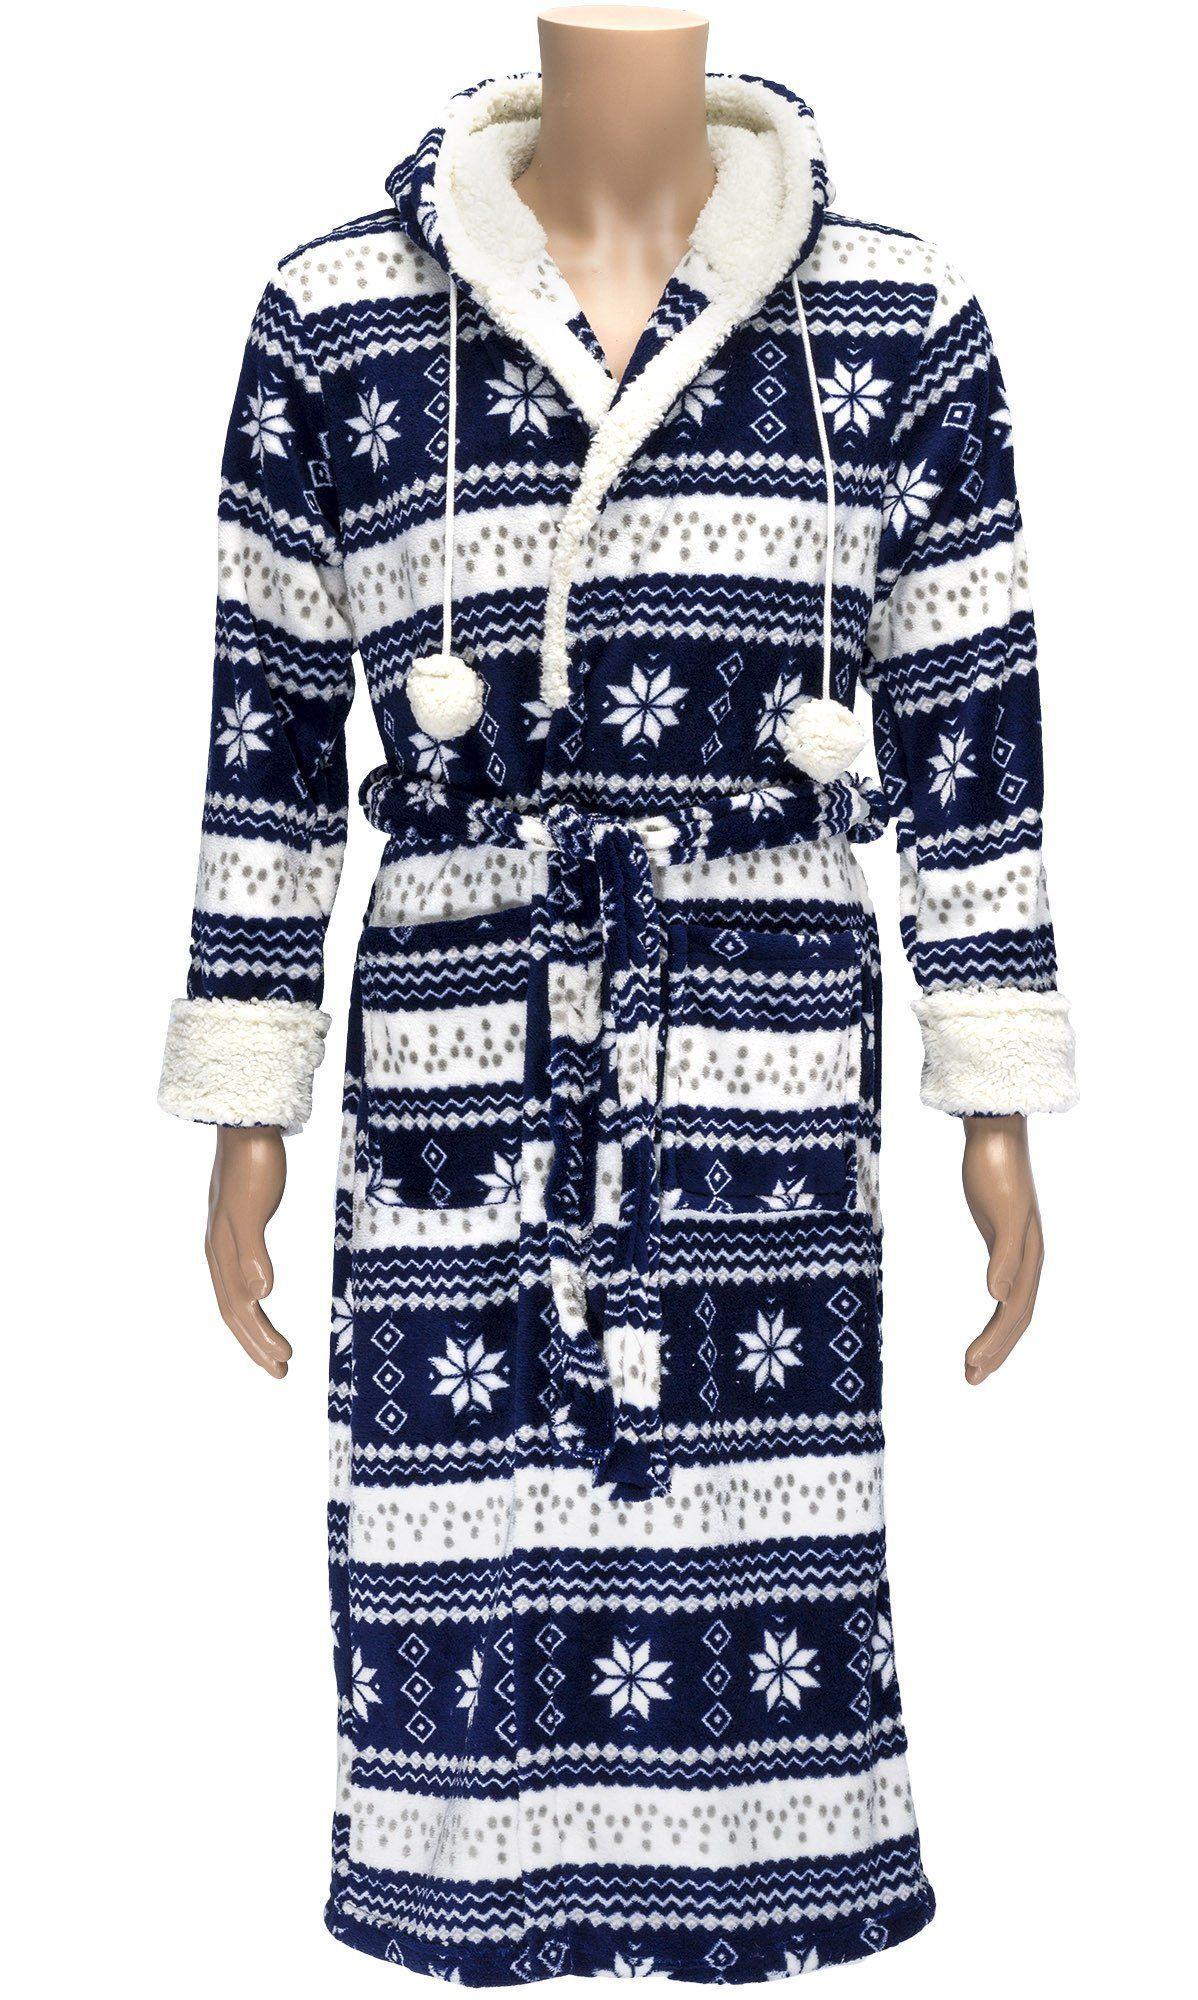 Romanta Nordic Fleece Robe With Belt  7bc85fd28